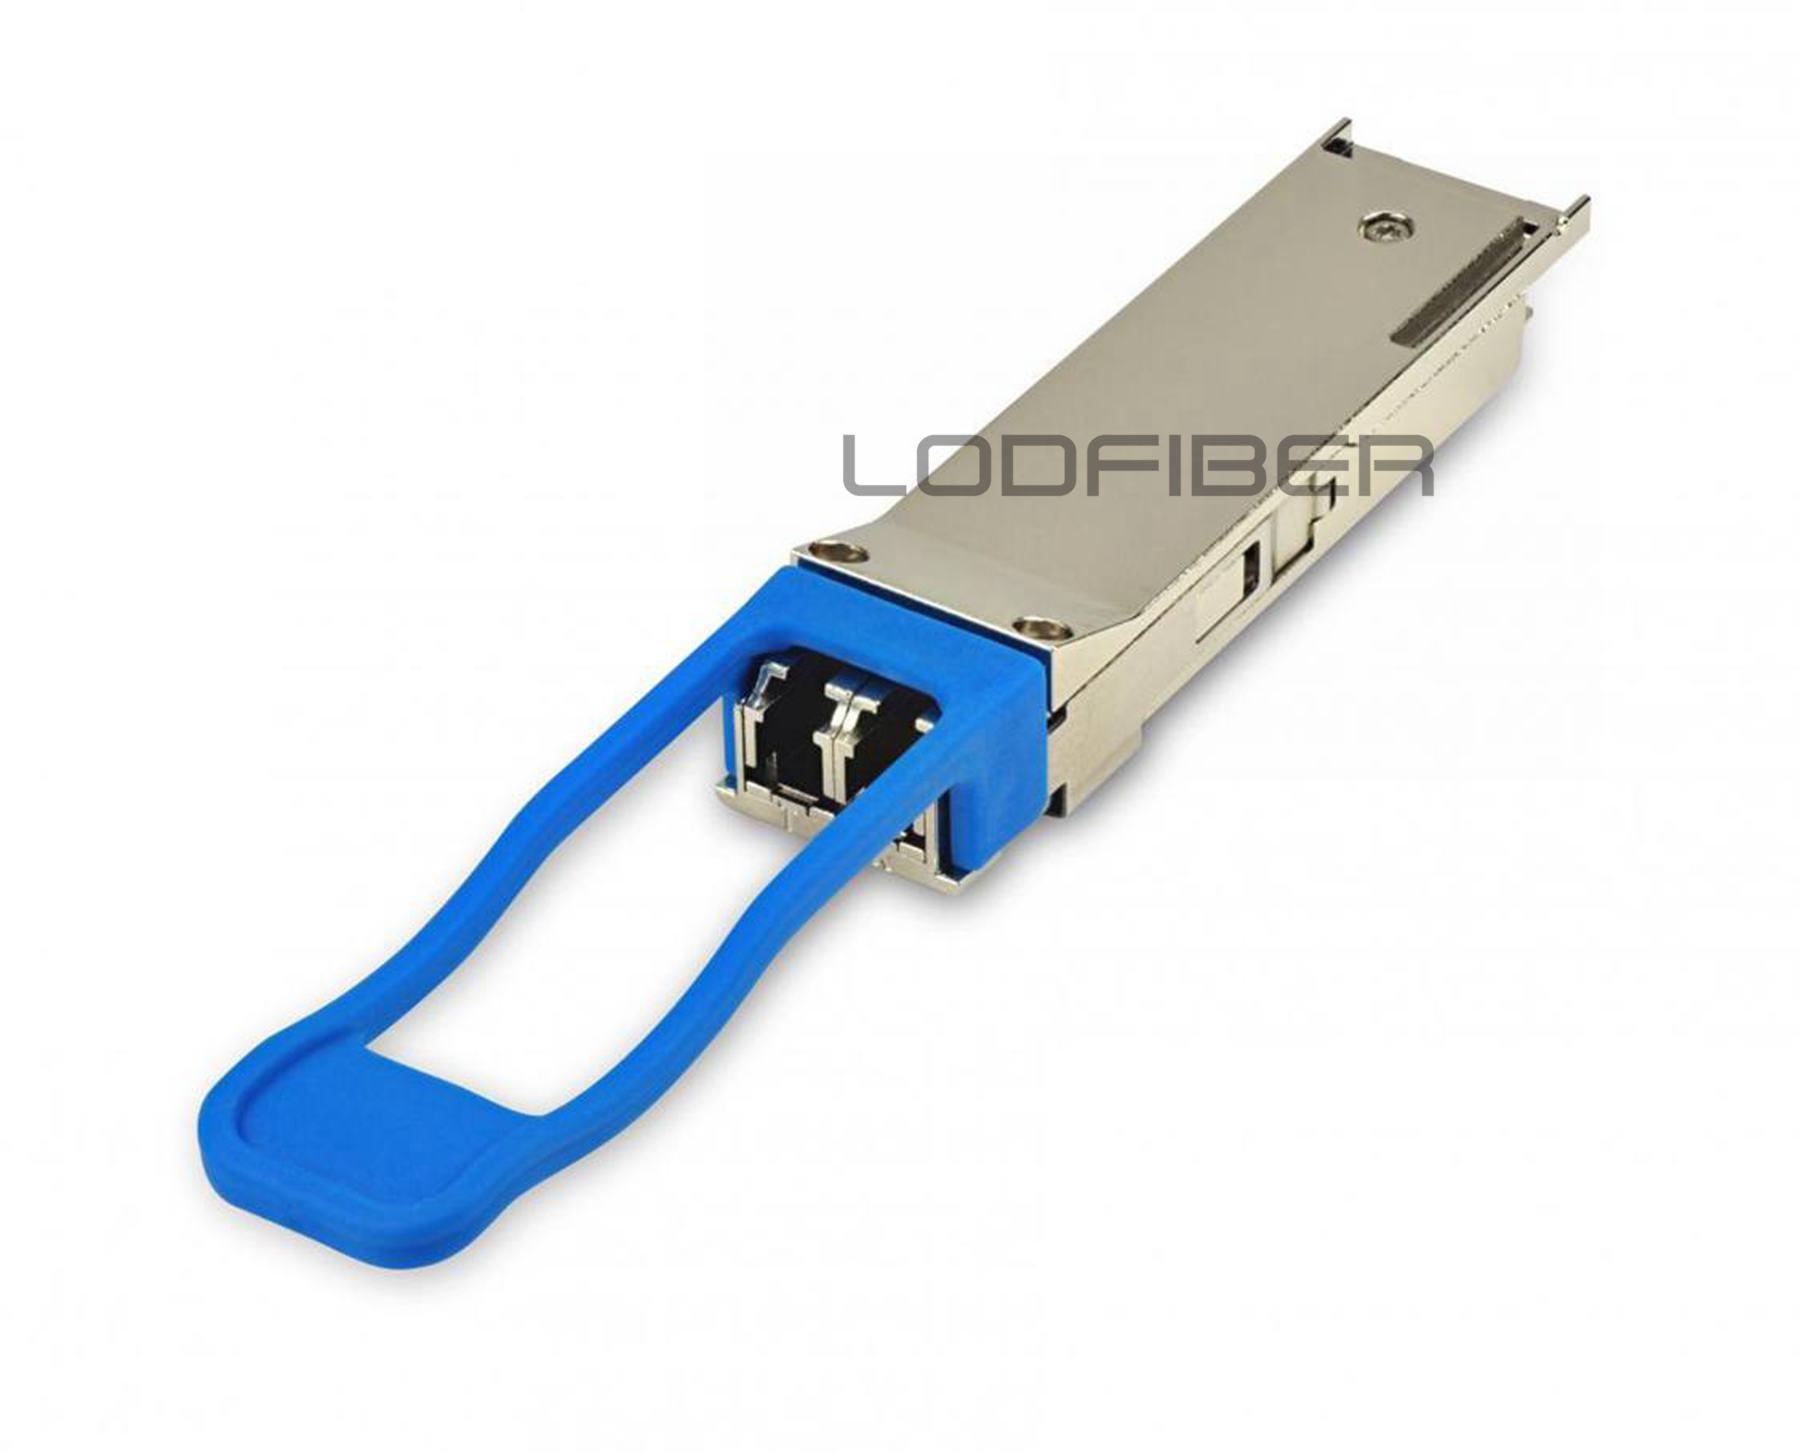 LODFIBER JNP-QSFP-40GE-LR4 J-u-n-i-p-e-r Networks Compatible 40GBASE-LR4 QSFP+ 1310nm 10km LC Transceiver